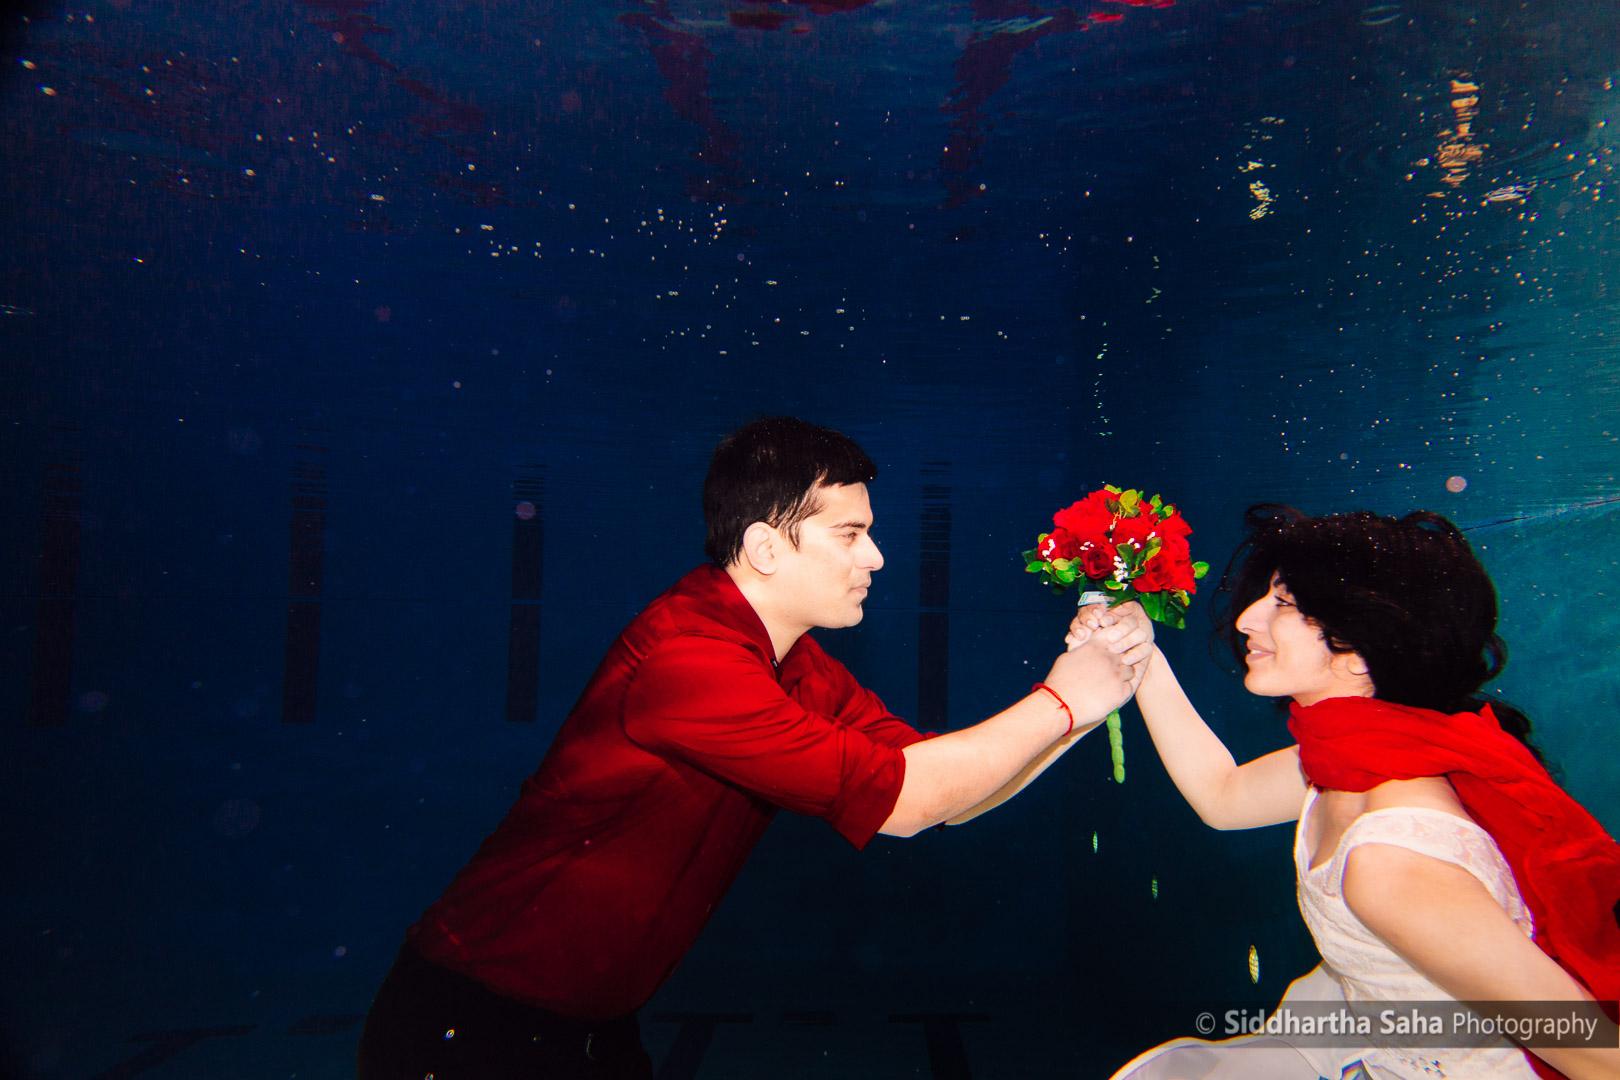 2015-04-12 - Saloni Vaibhav Underwater Shoot - _O5C4630-01